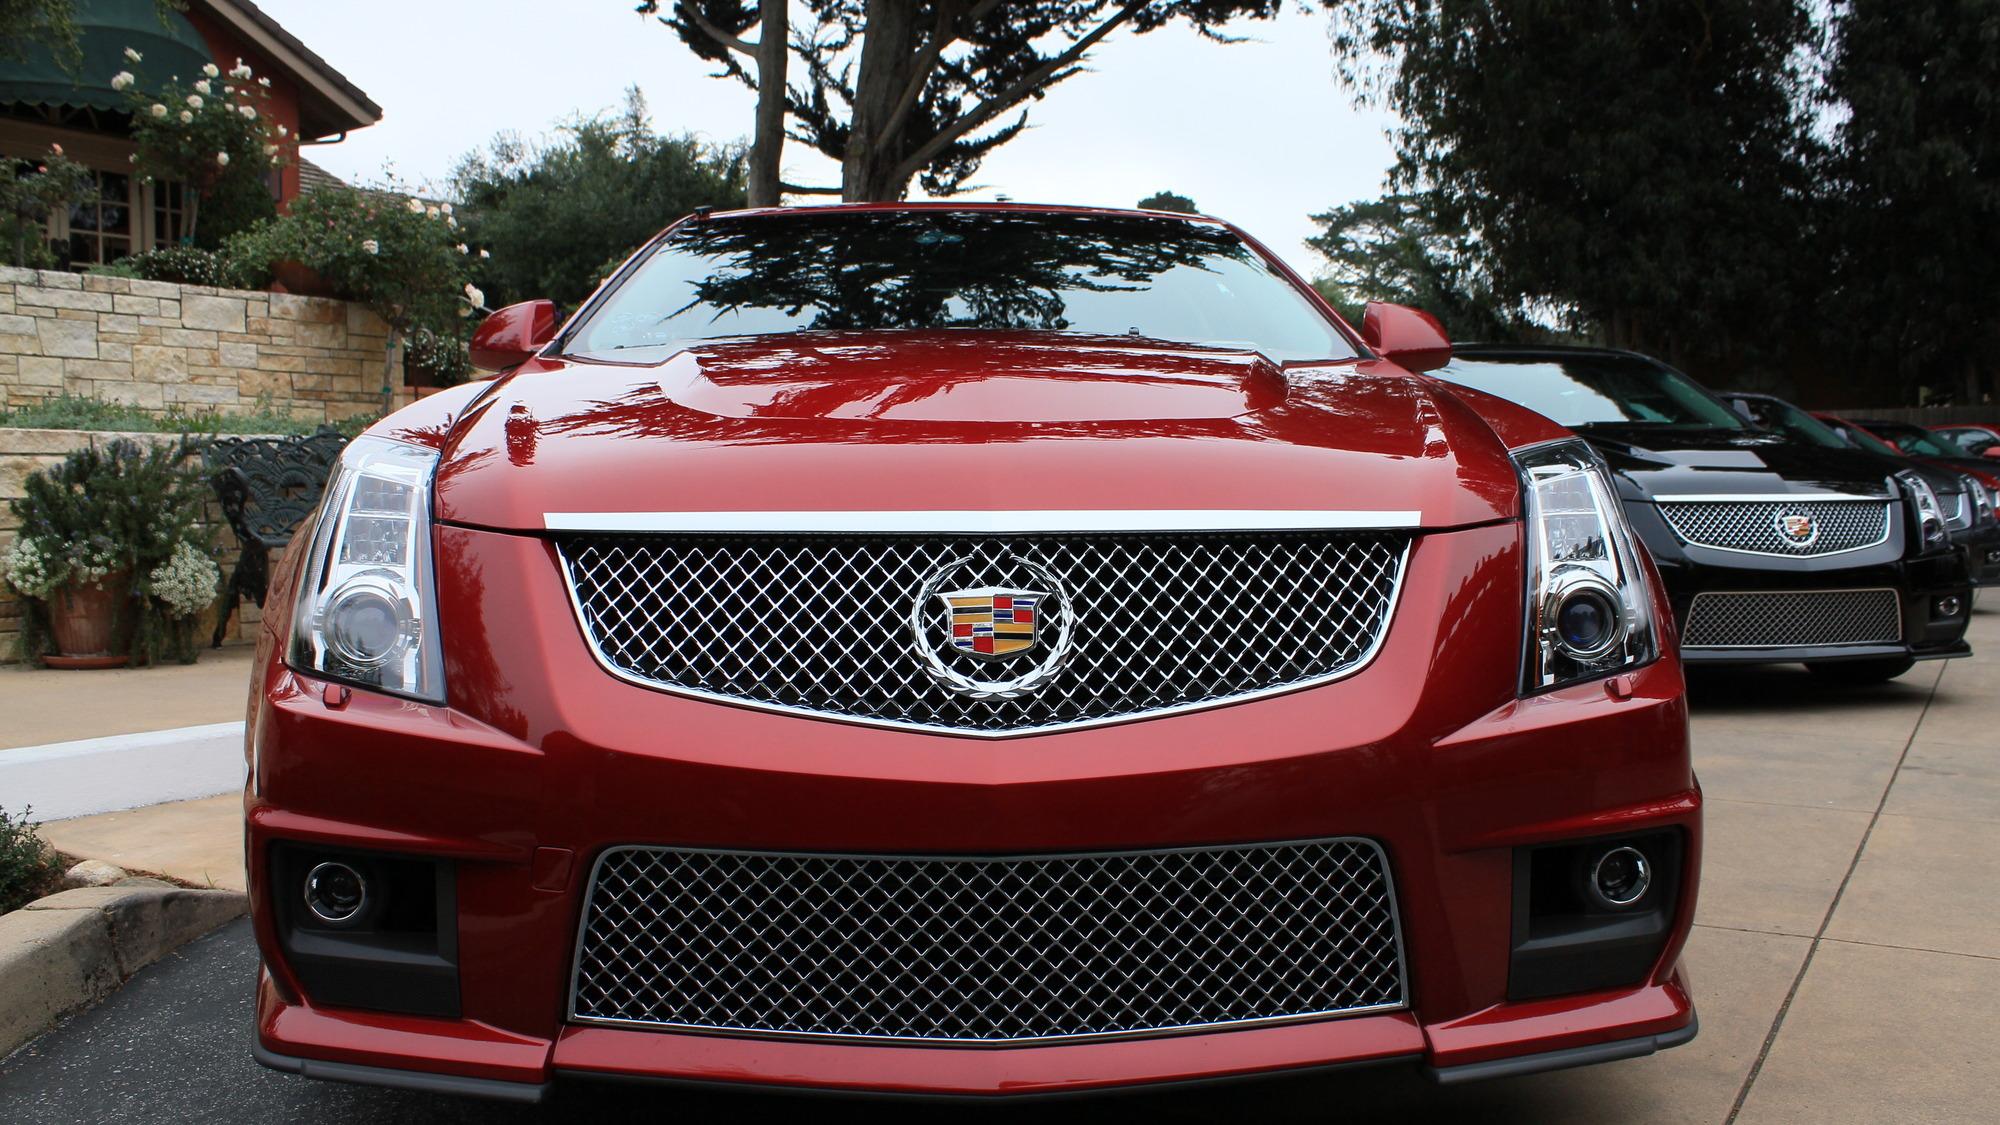 First Drive: 2011 Cadillac CTS-V Wagon